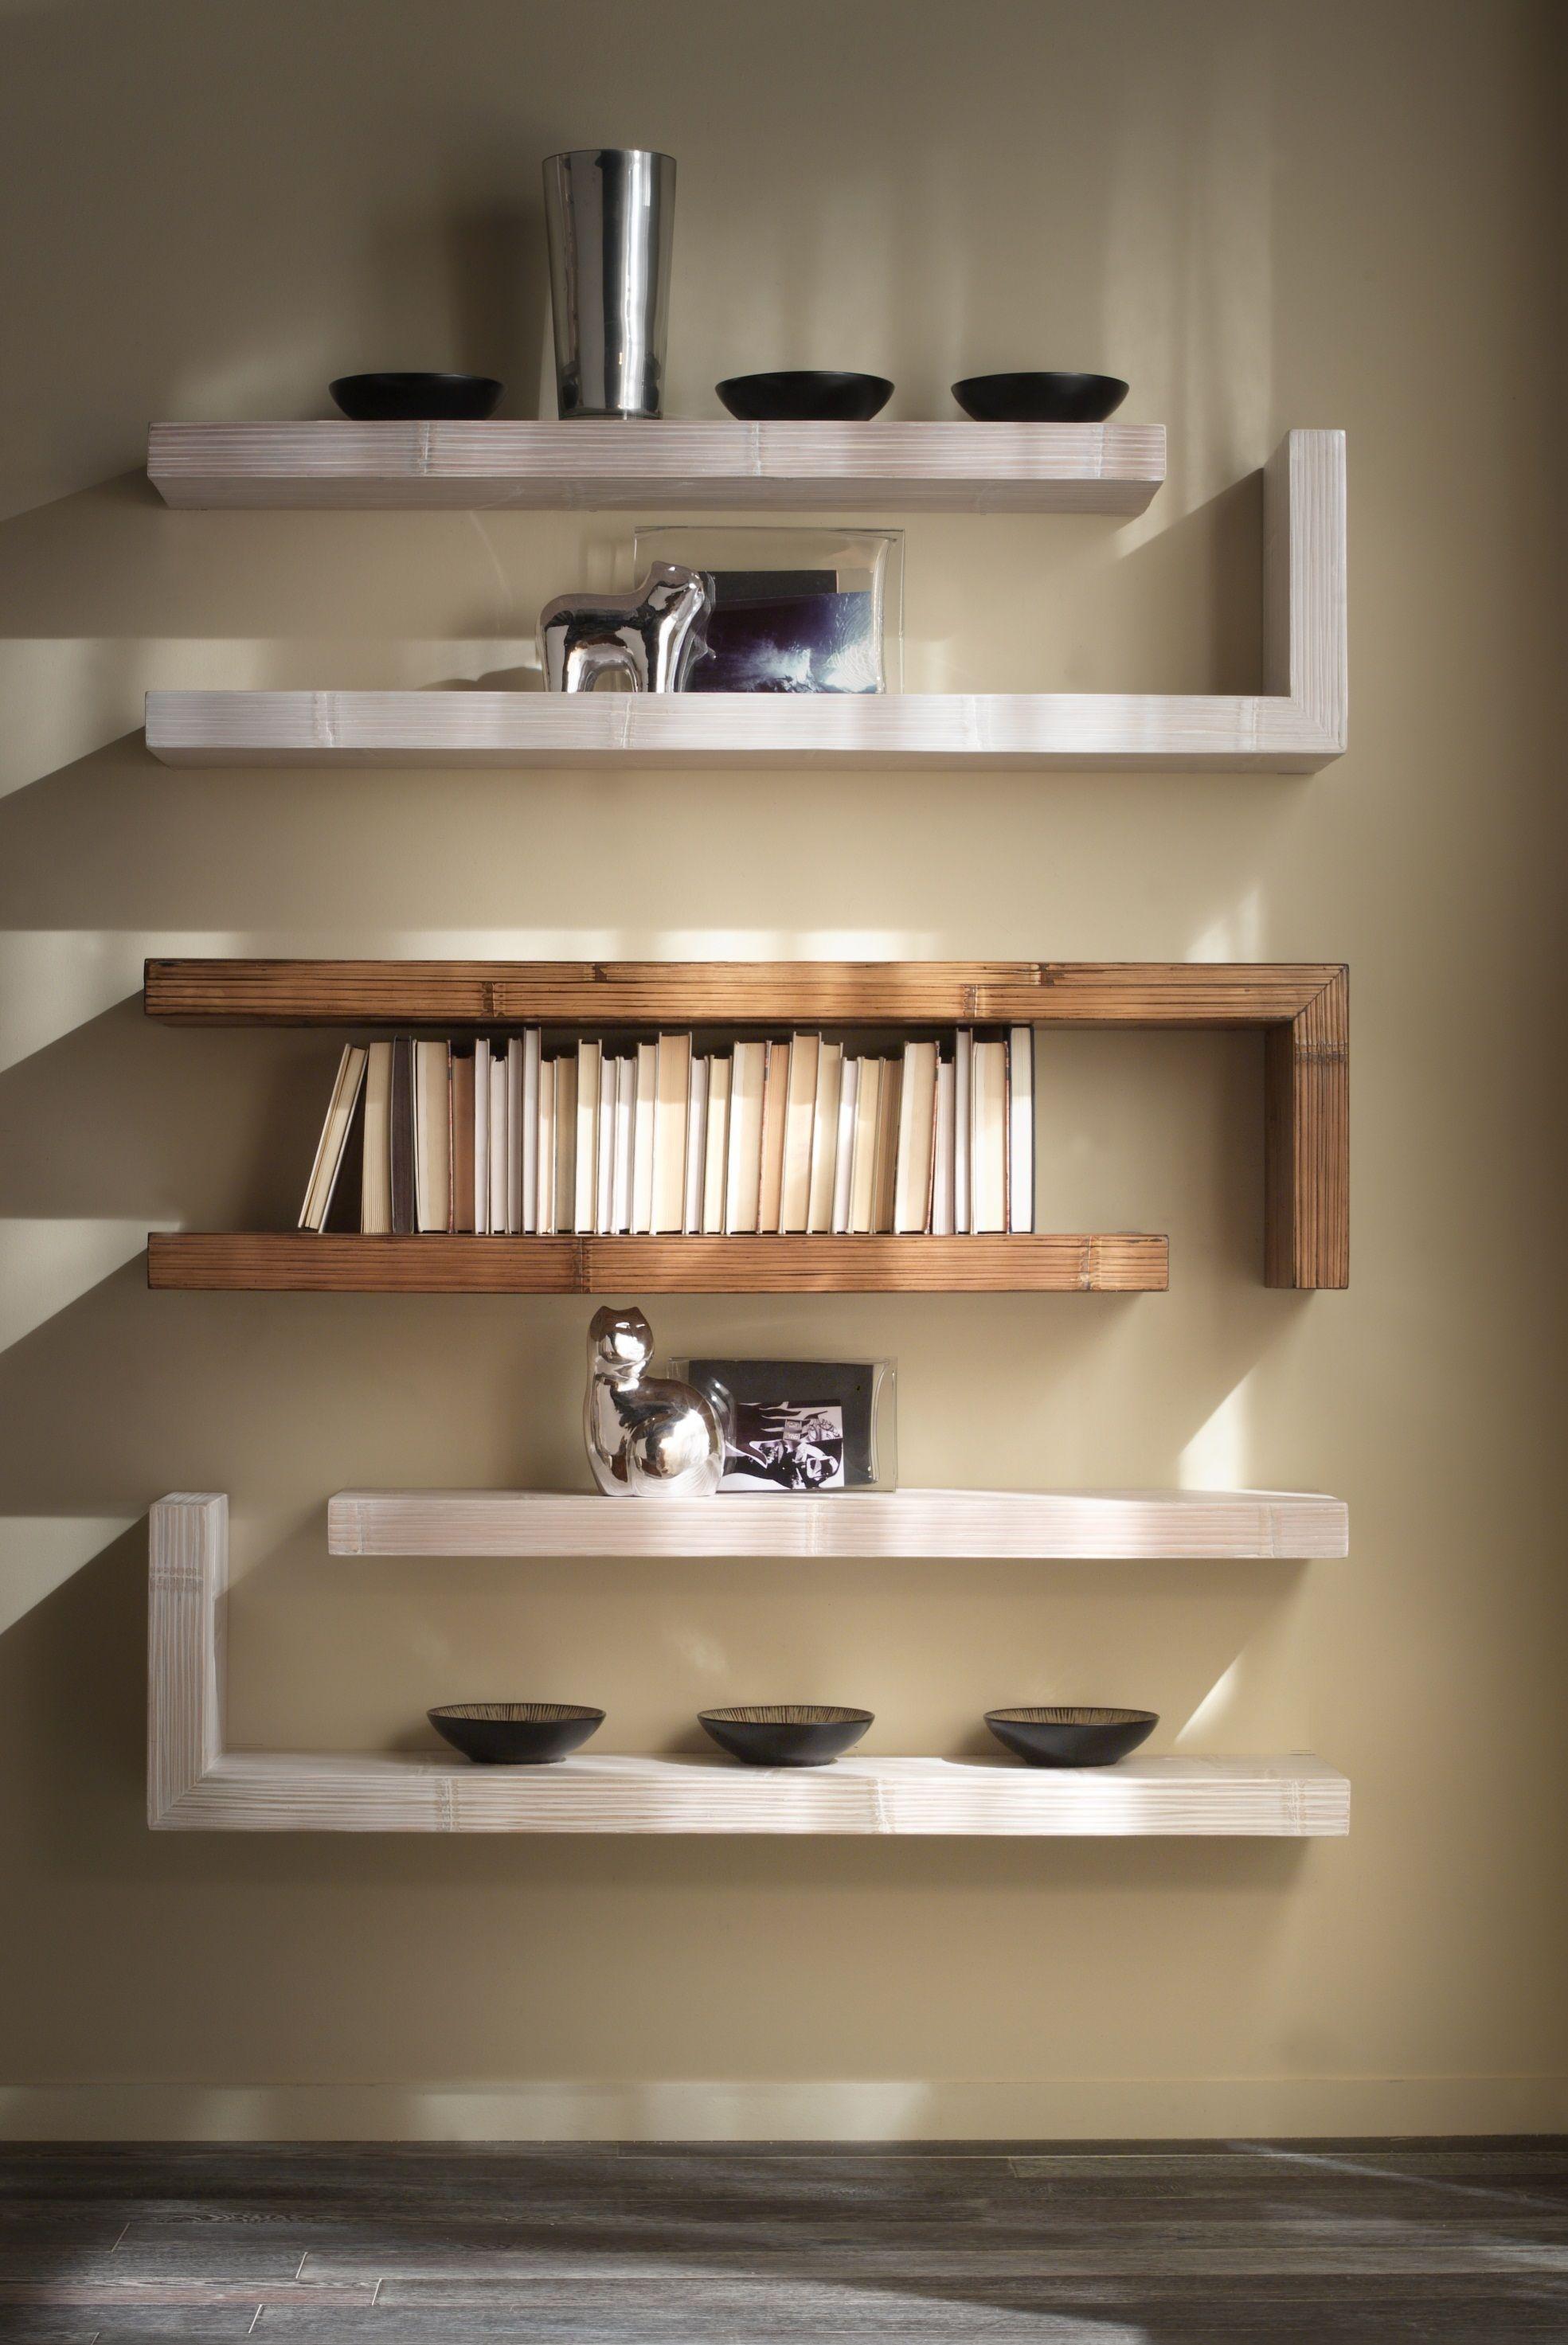 Librerie e mensole per il salotto homcom: Mensole Essential Casa Del Bambu Shelves Shelf Design Wall Shelves Design